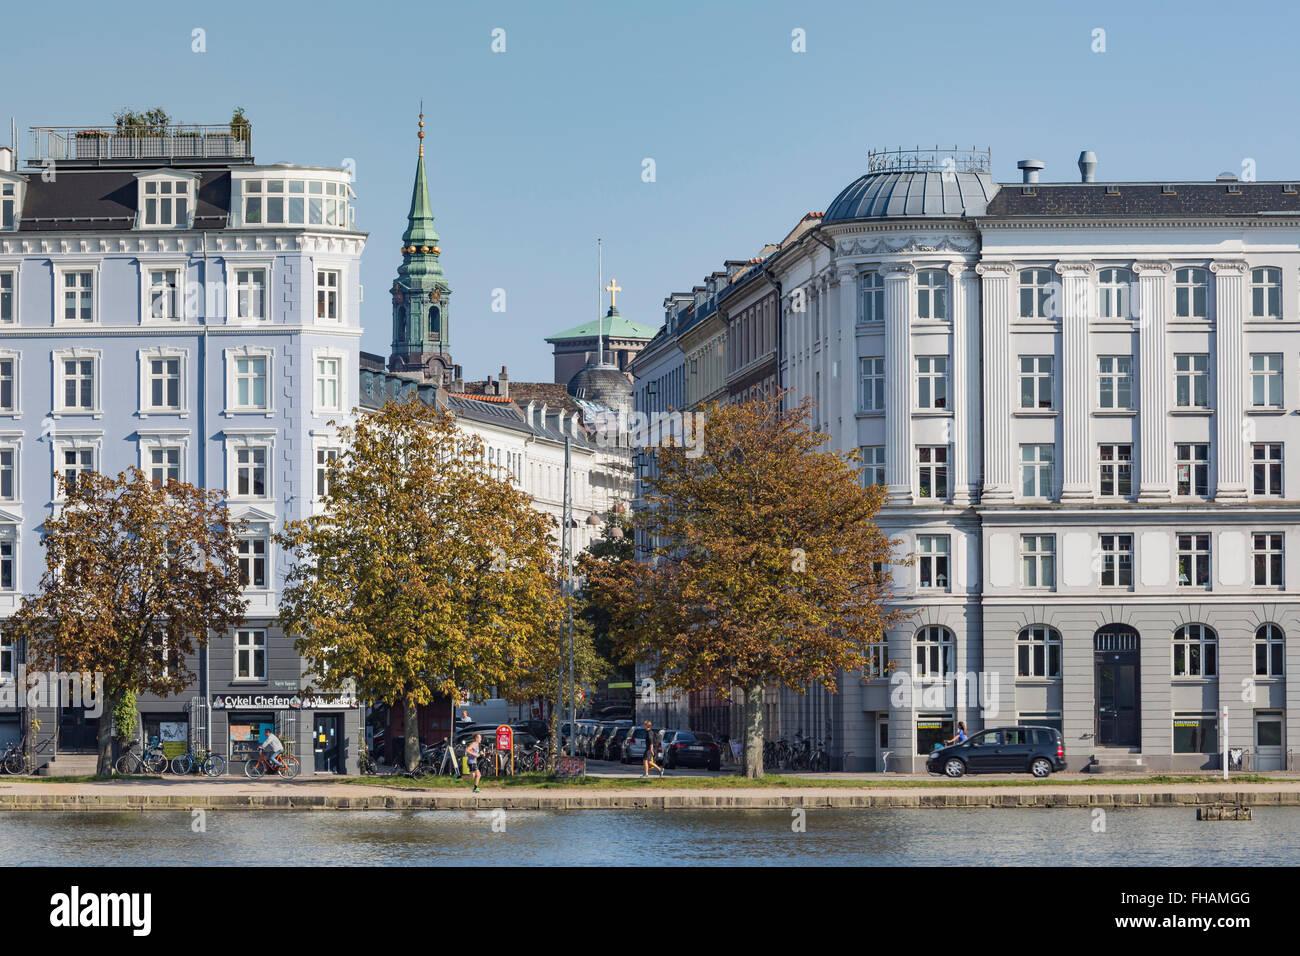 COPENHAGEN, DENMARK -SEPTEMBER 8: Sortedams Soe in Copenhagen, Denmark  in September 8, 2014. - Stock Image